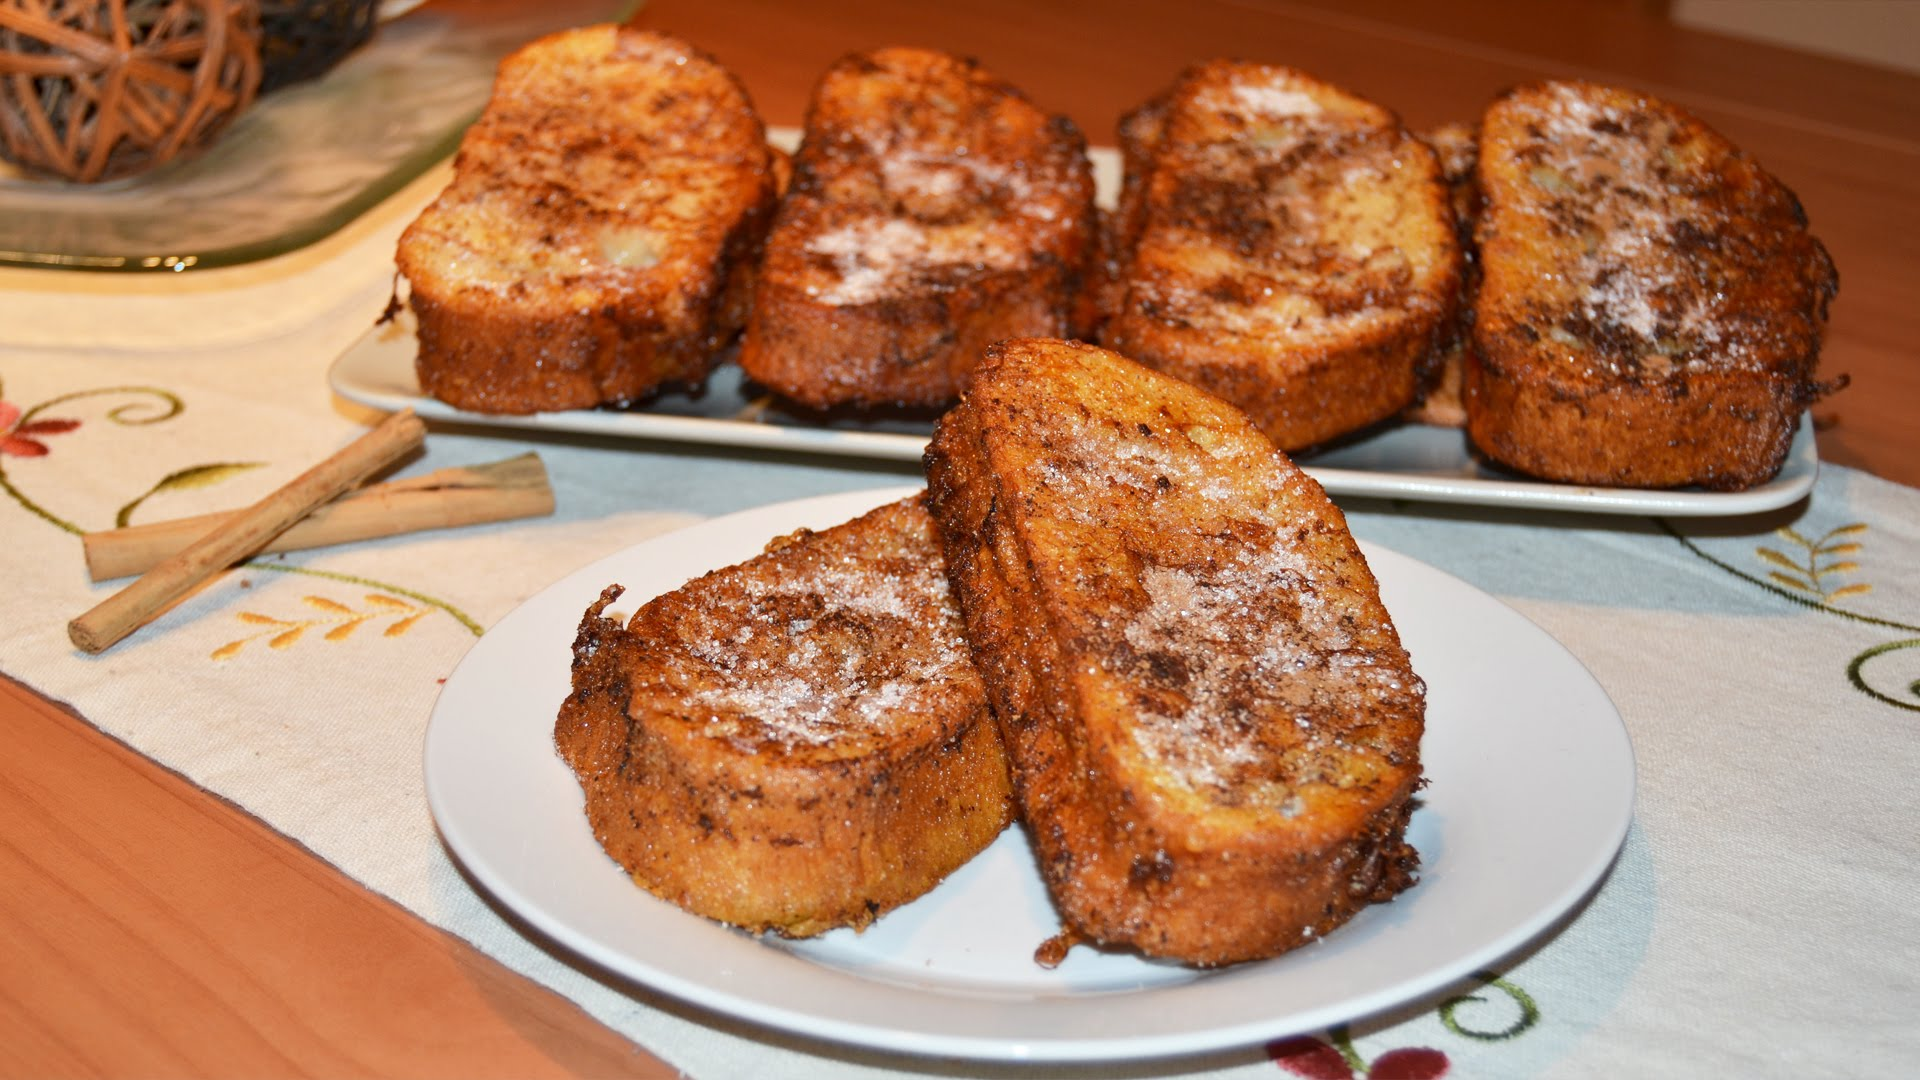 French Caramel Cake